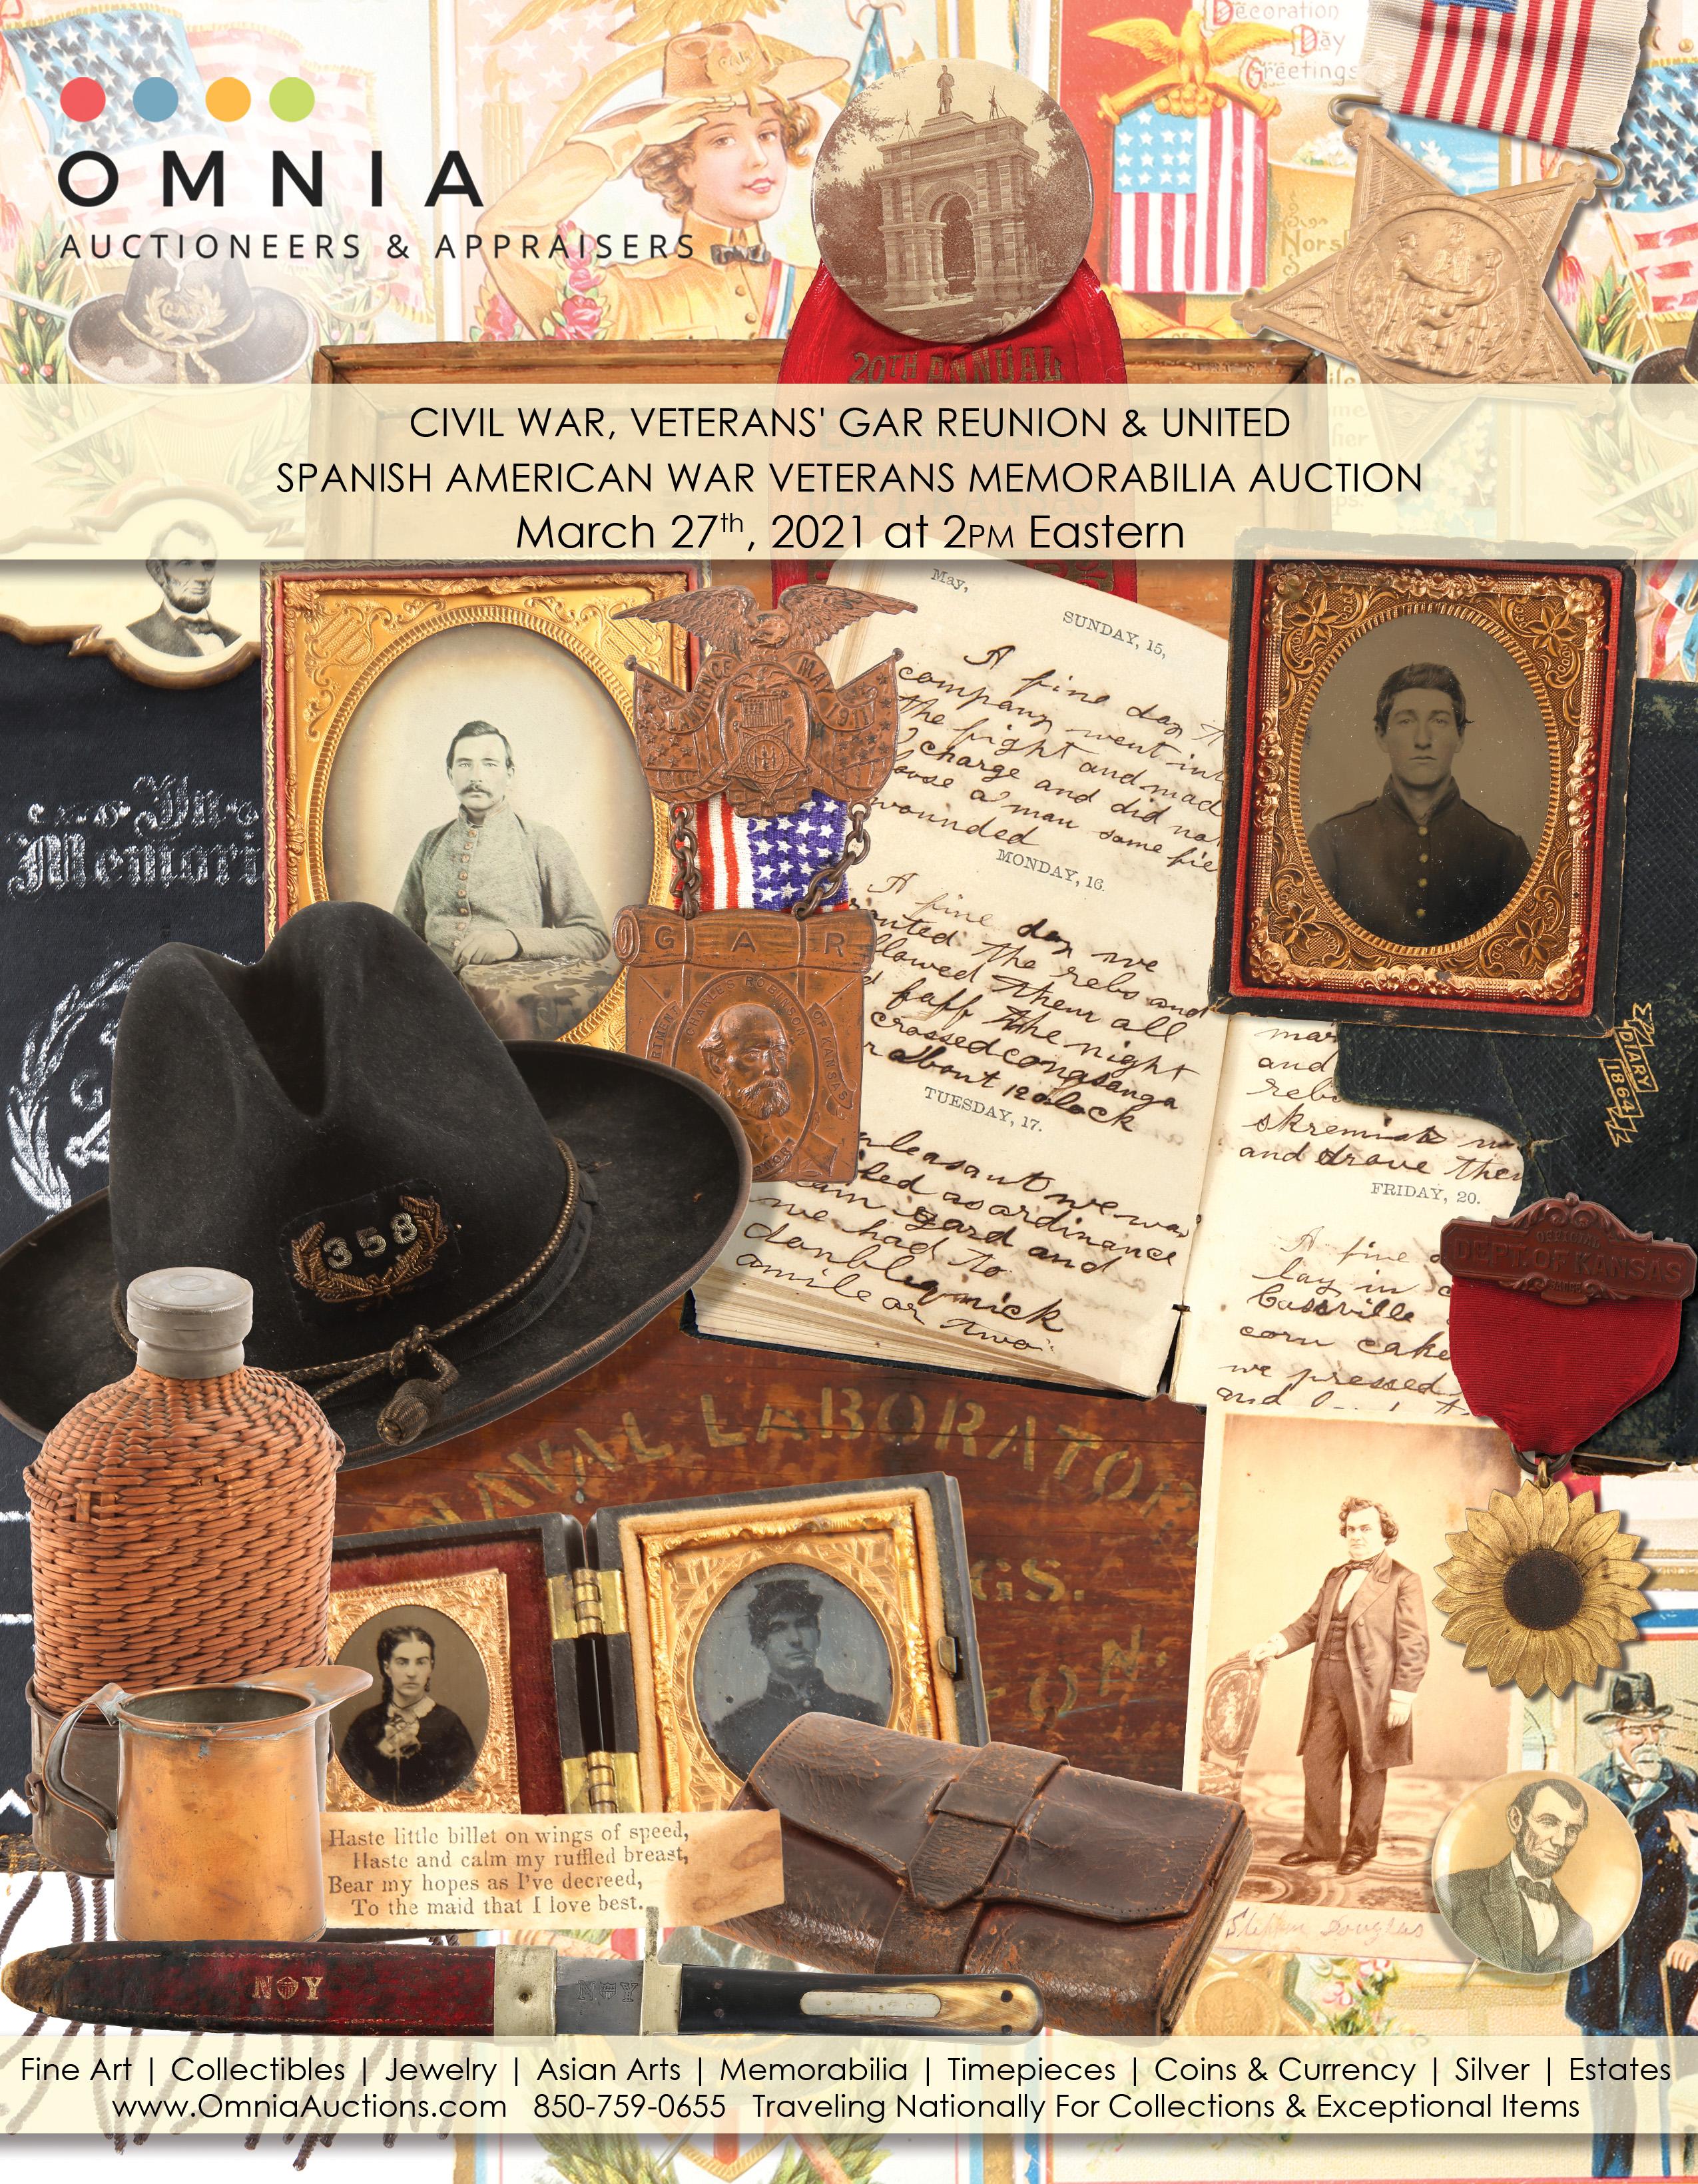 Civil War Veteran GAR Reunion Spanish American War Veteran Auction - Buy, Sell, Appraise 327